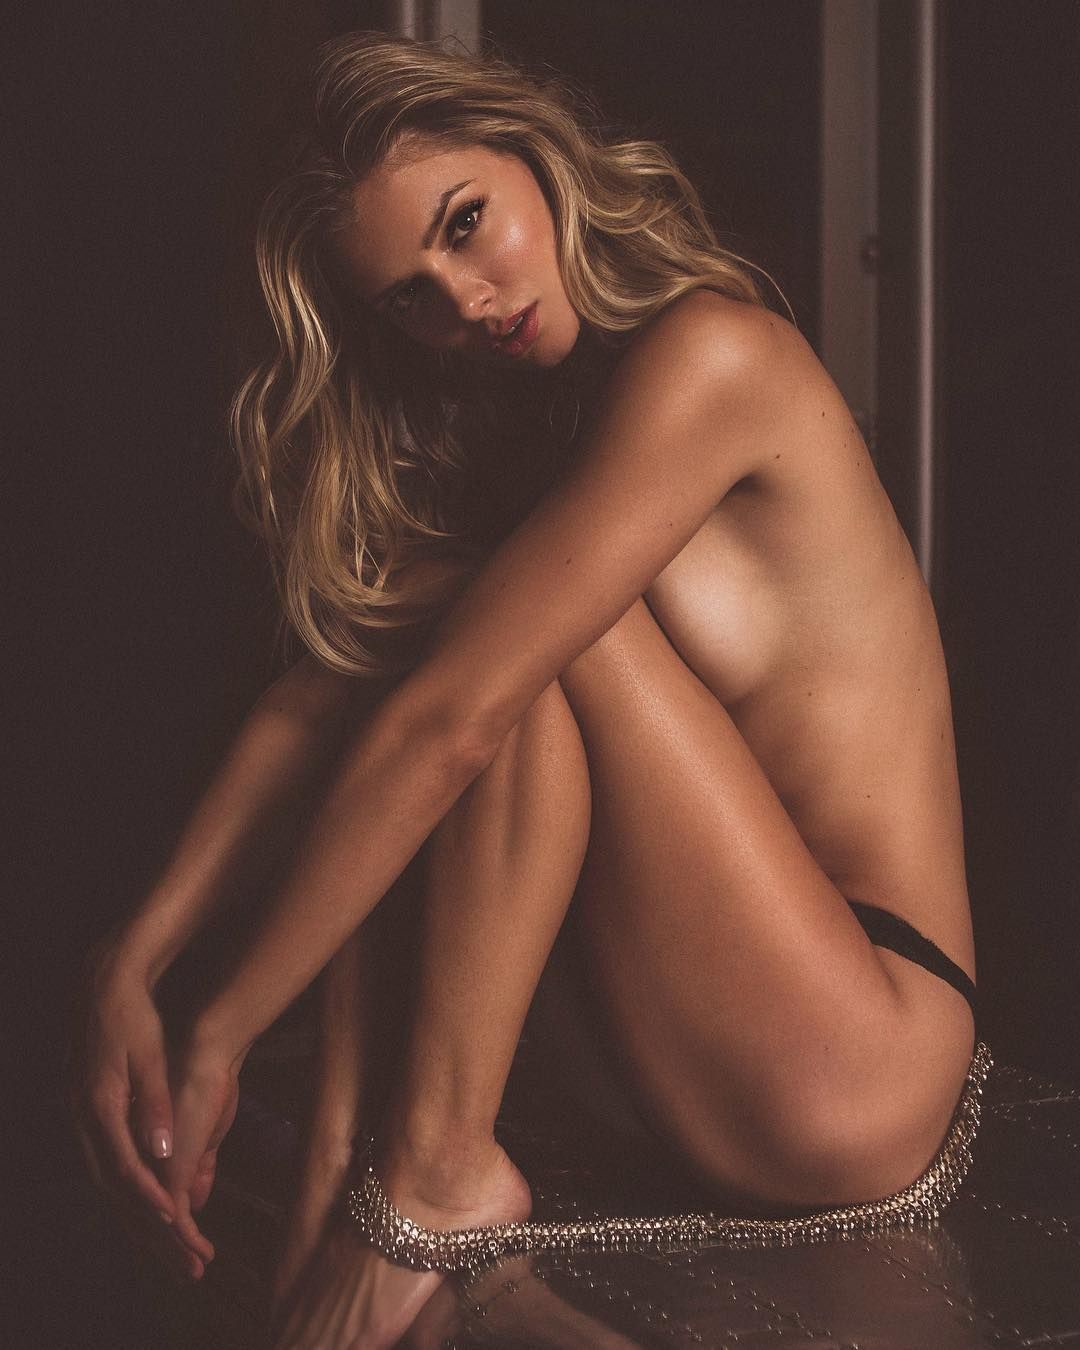 Danielle knudson naked